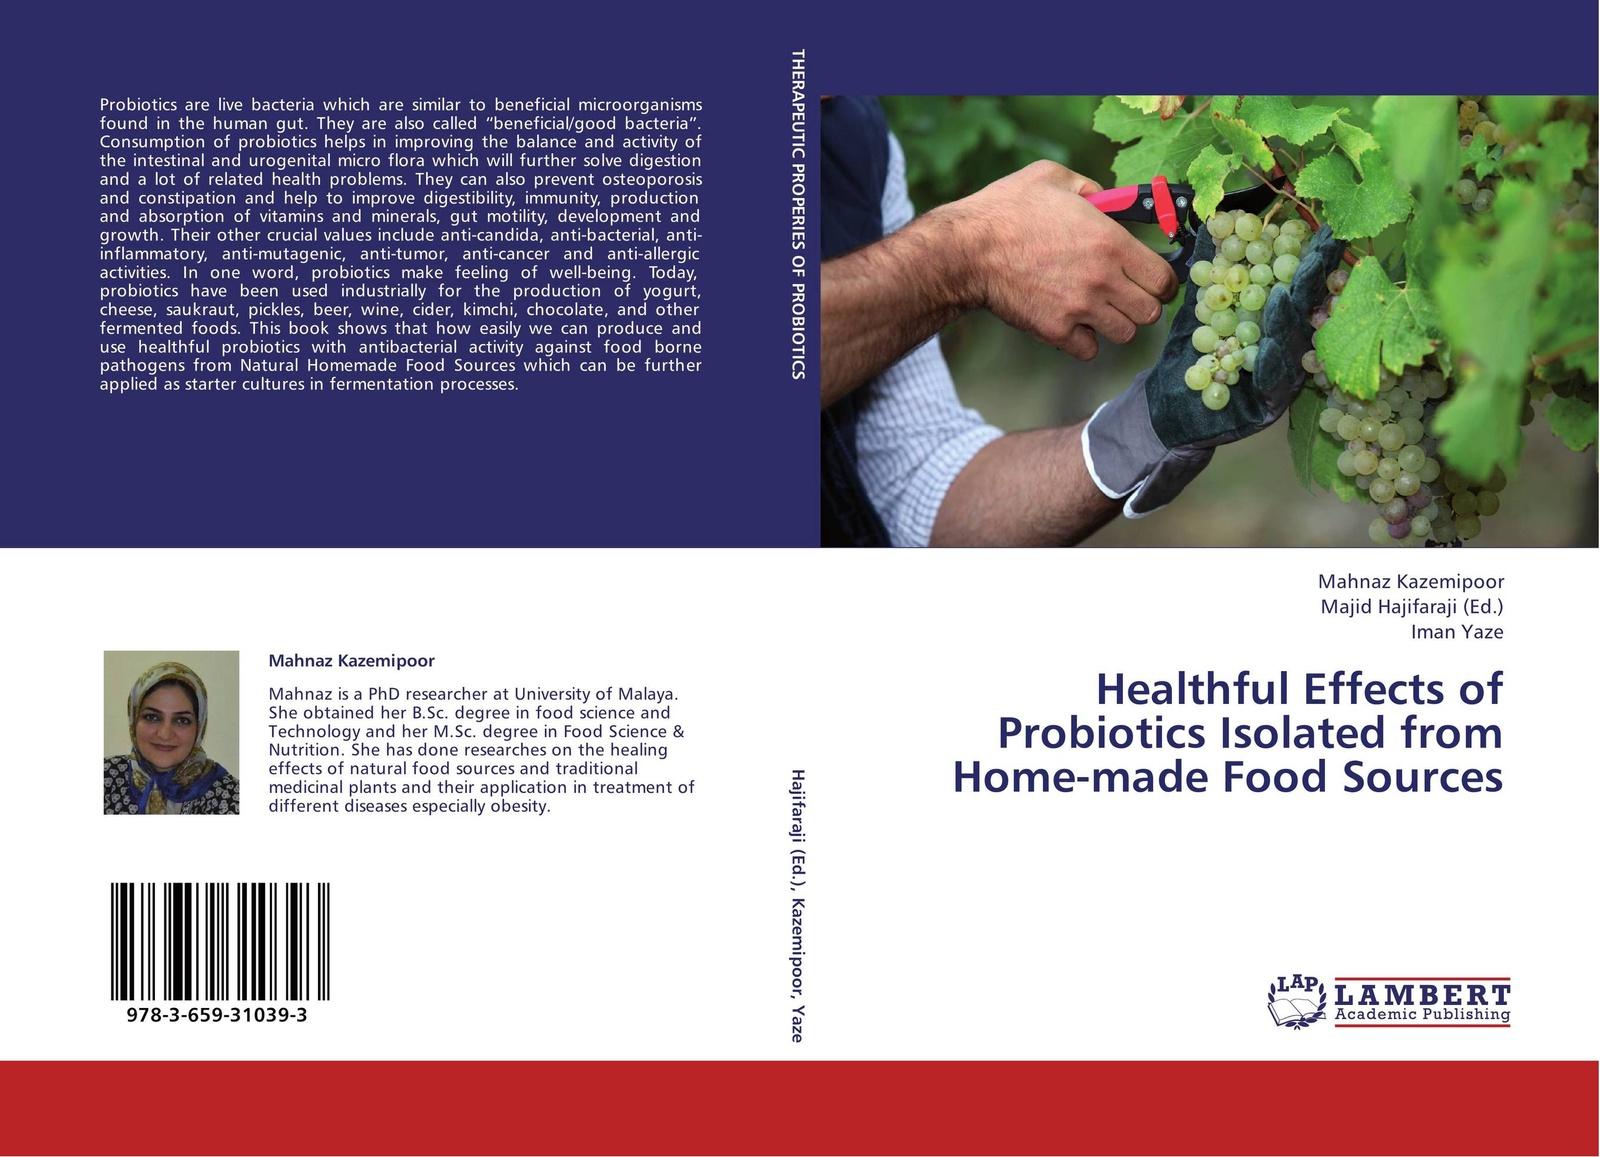 Mahnaz Kazemipoor,Majid Hajifaraji and Iman Yaze Healthful Effects of Probiotics Isolated from Home-made Food Sources все цены